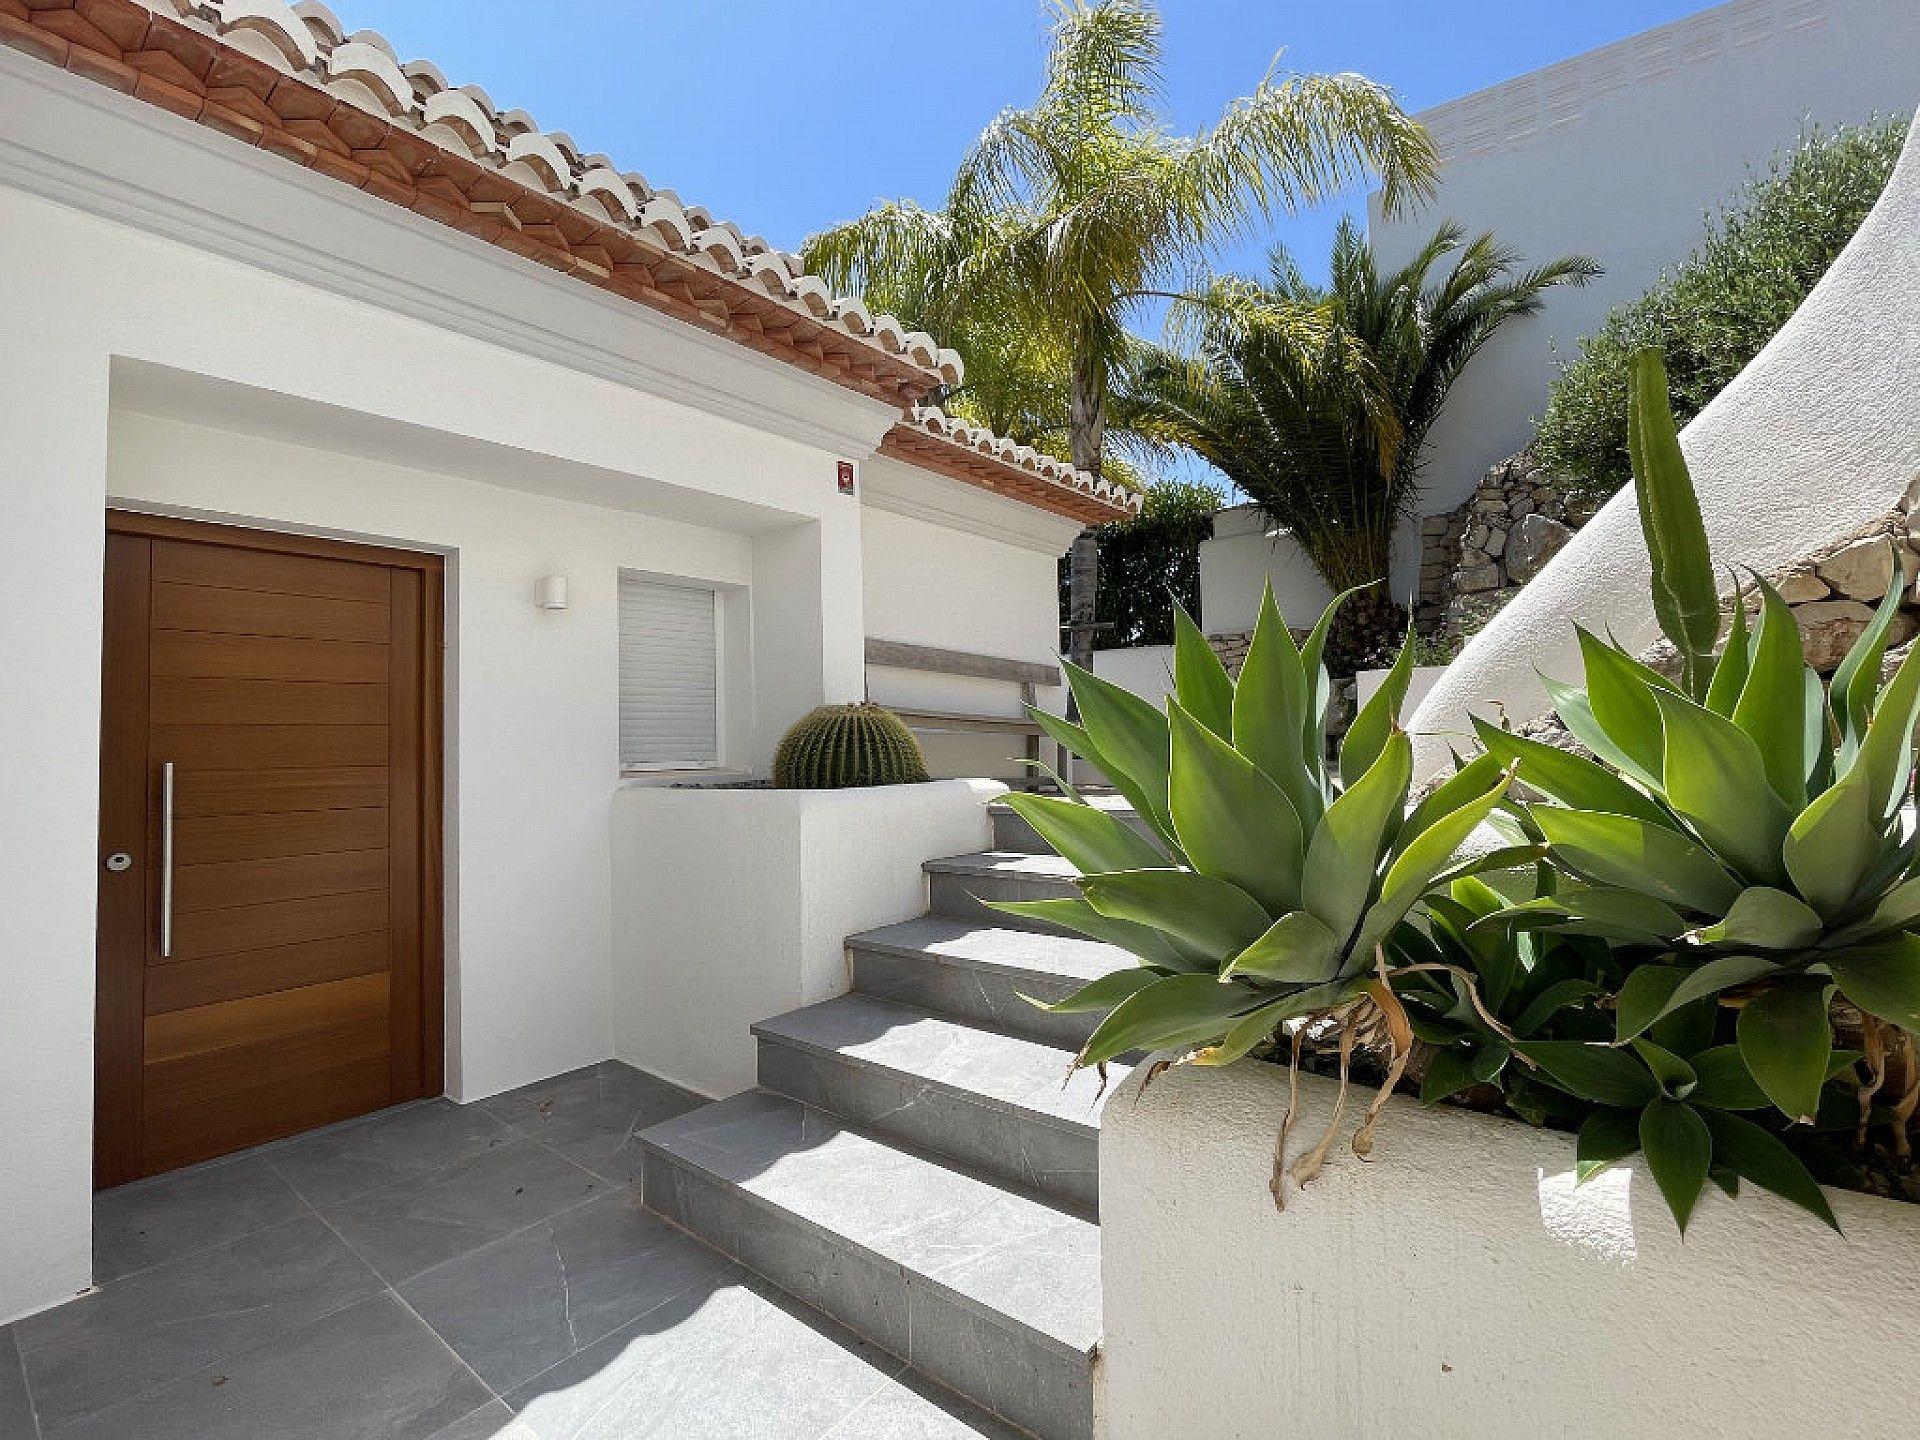 w_huis-tekoop-costa-blanca-benissa-spanje111-2-2-2-2-2.jpg